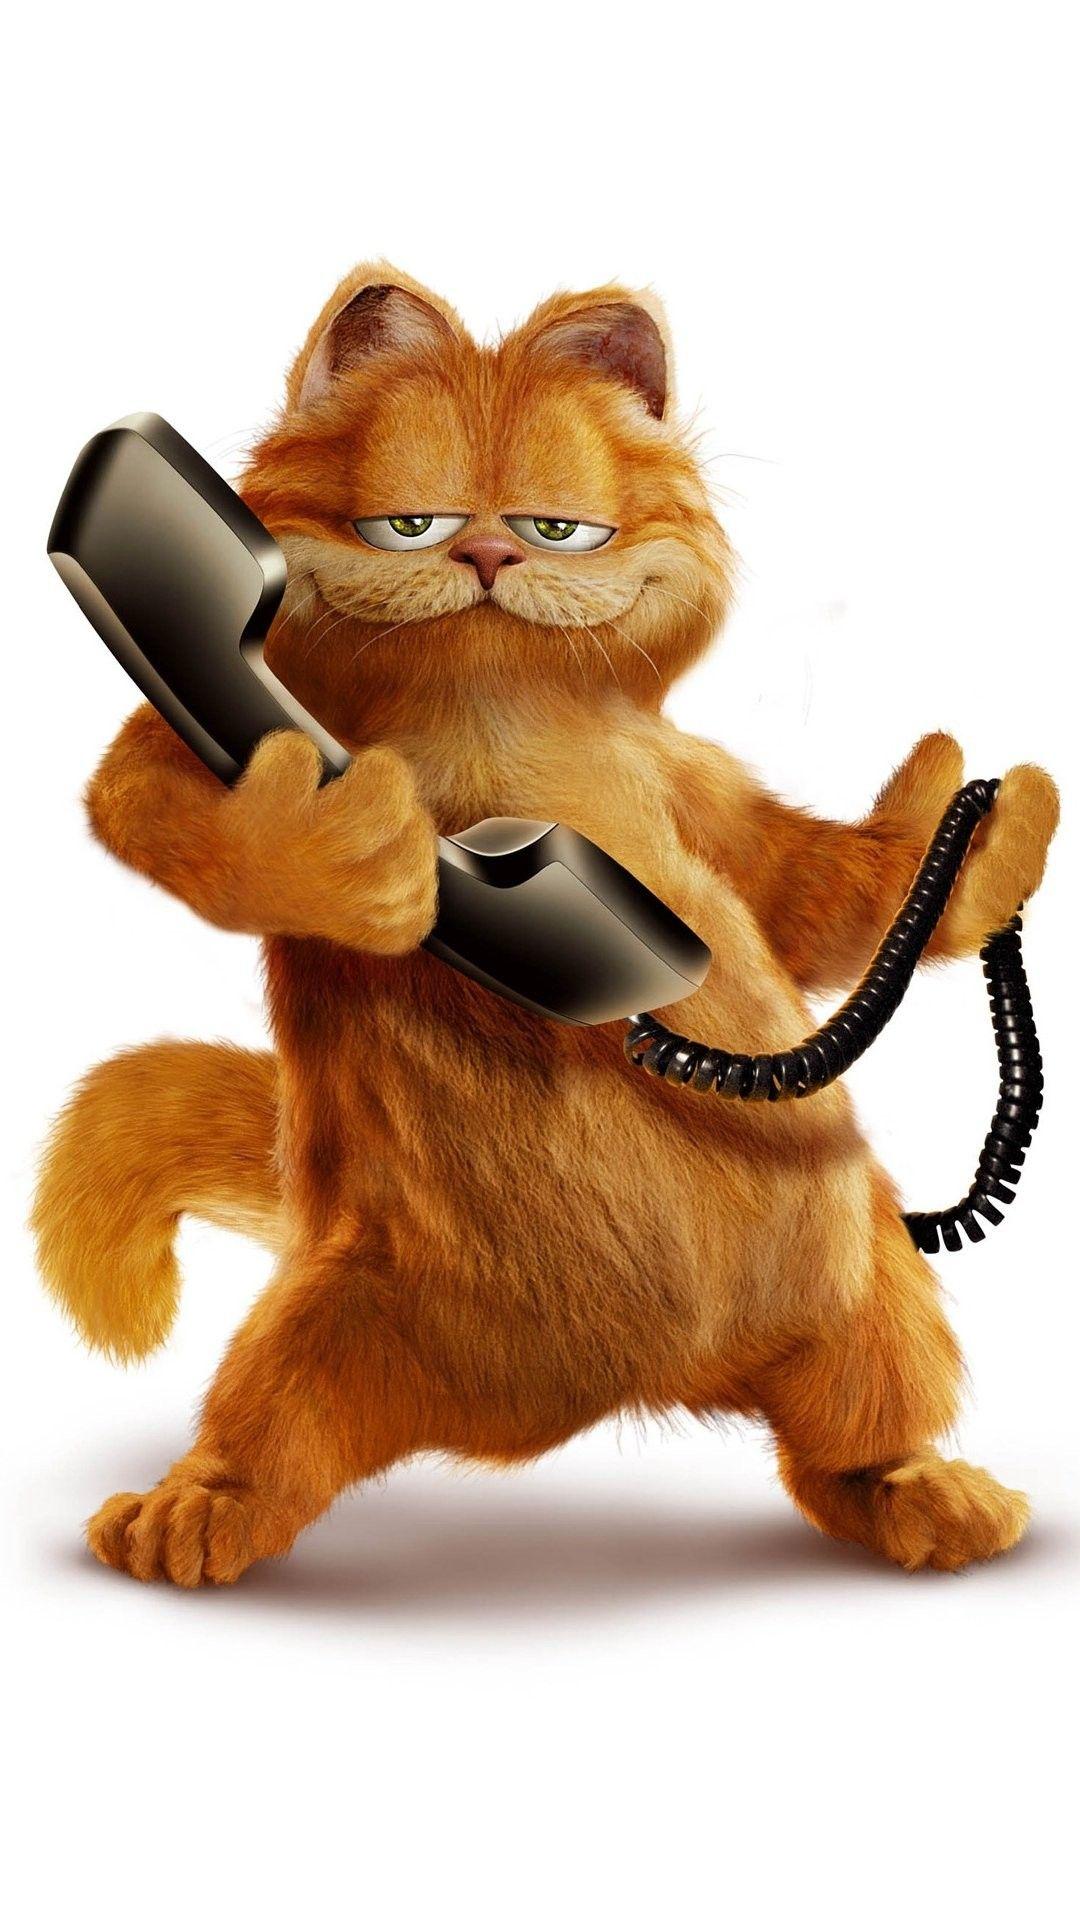 Free Garfield Iphone 6 Plus Wallpaper 16750 Cartoons Iphone 6 Plus Wallpapers Cat Cartoon Images Garfield Wallpaper Garfield Images